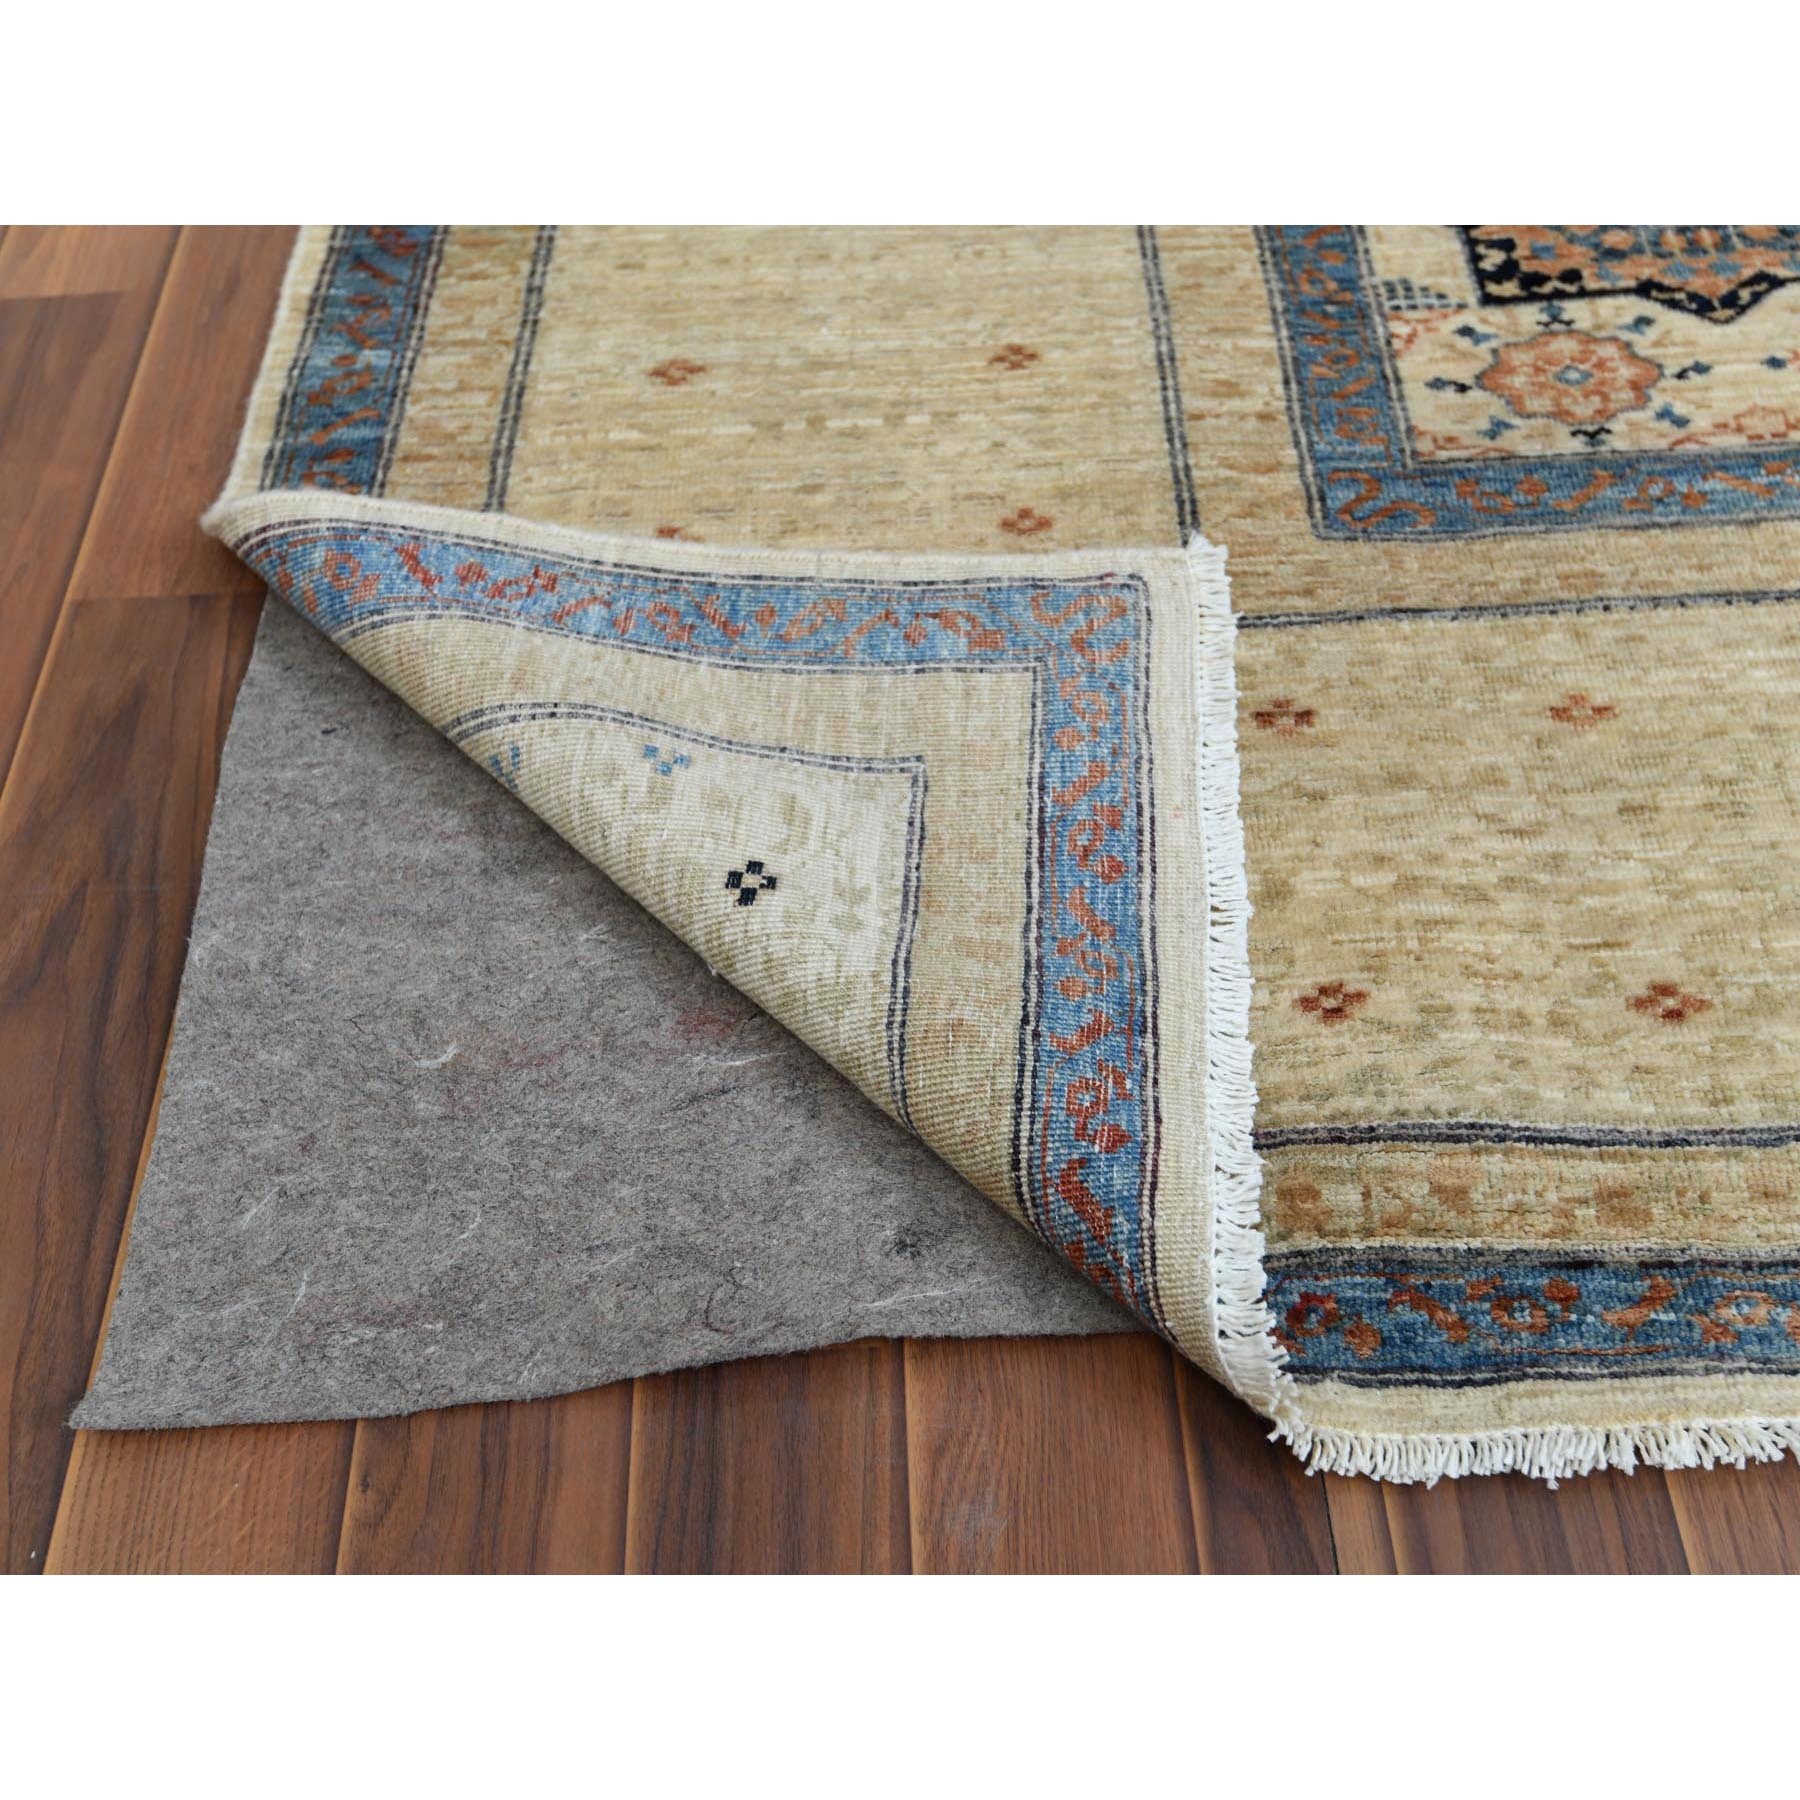 "11'9""x14'3"" Oversized Ivory Shiny Wool Super Fine Peshawar Mamluk Design with Denser Weave Even Pile Hand Knotted Oriental Rug"